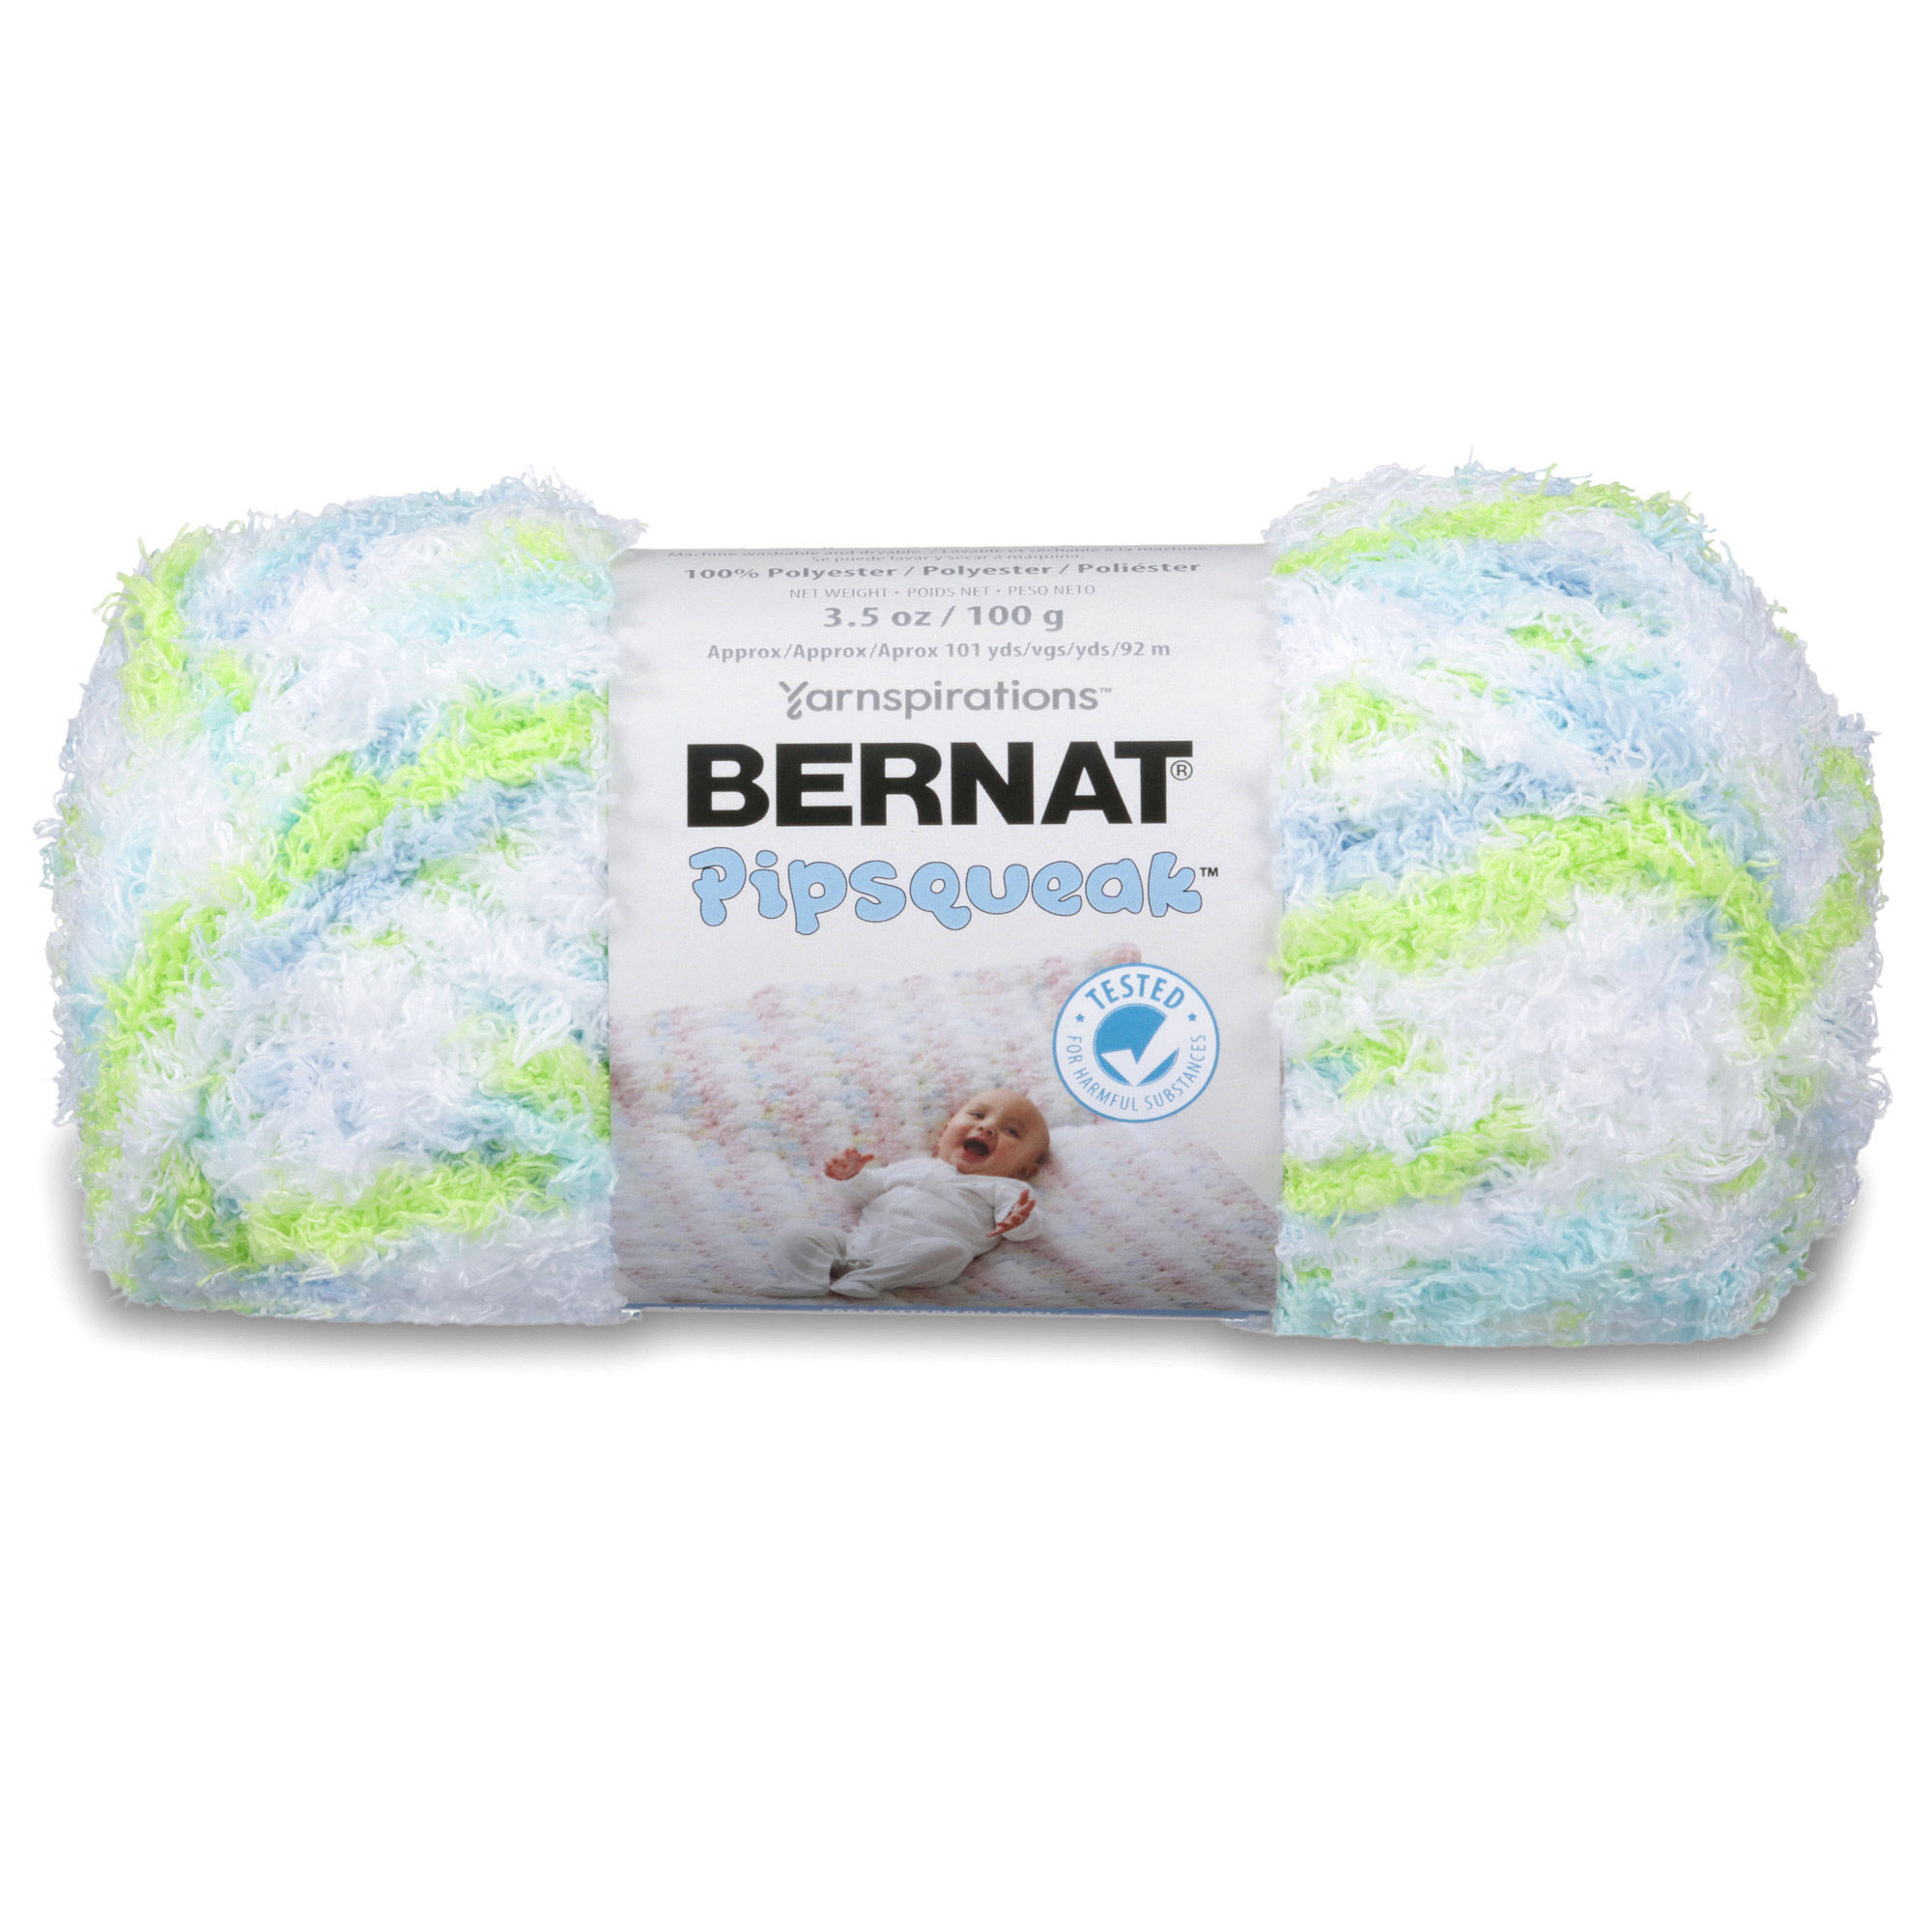 Pipsqueak Yarn - Walmart.com